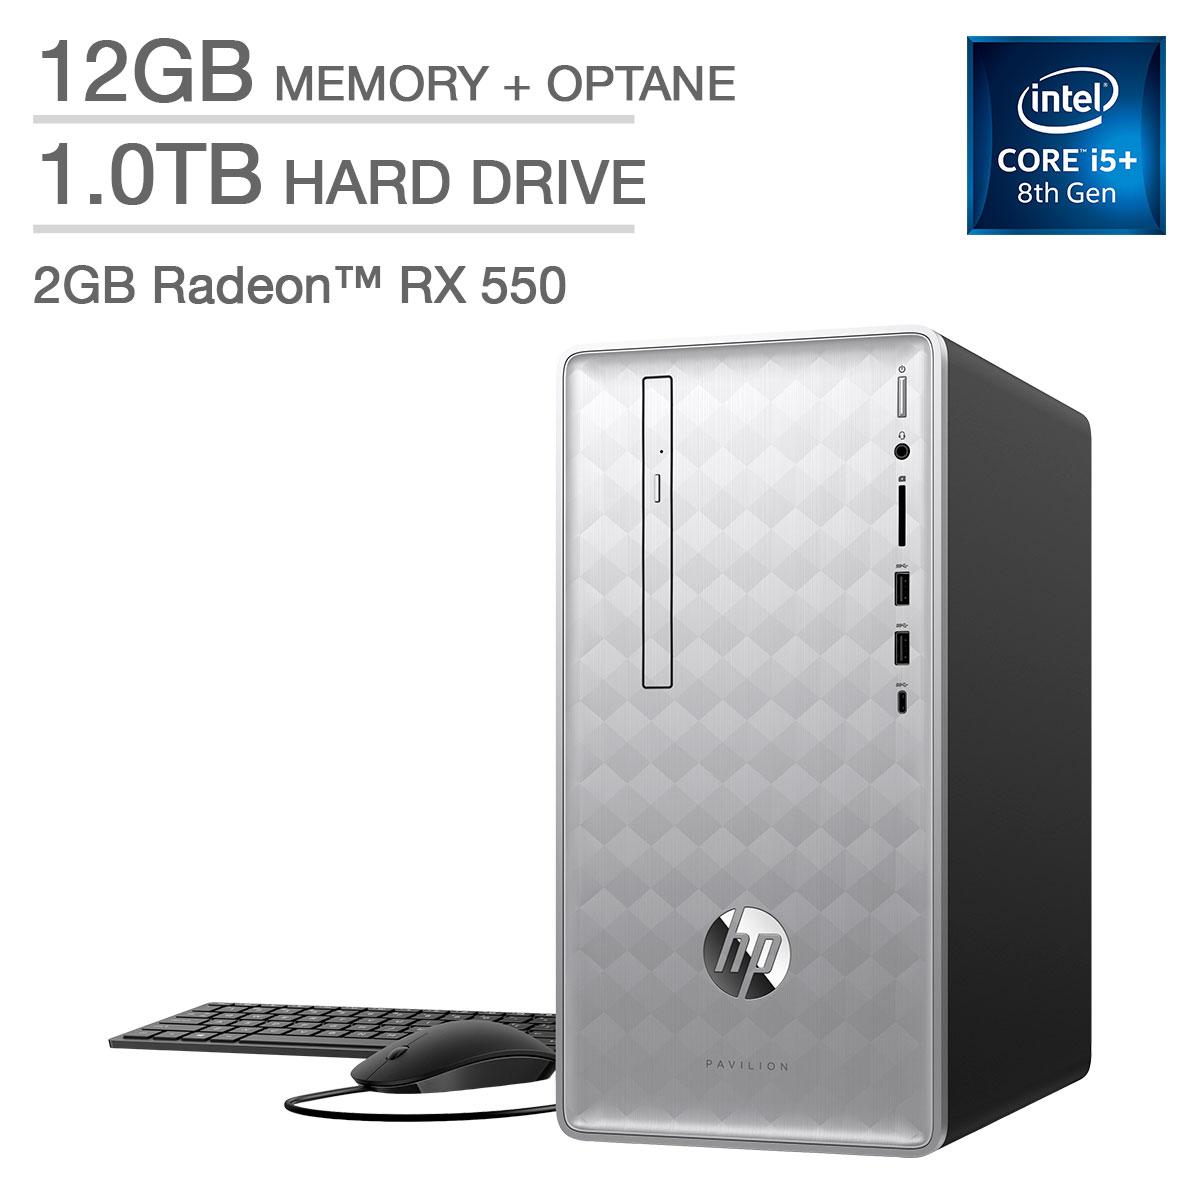 HP Pavilion Desktop - Intel Core i5 - 2GB Graphics